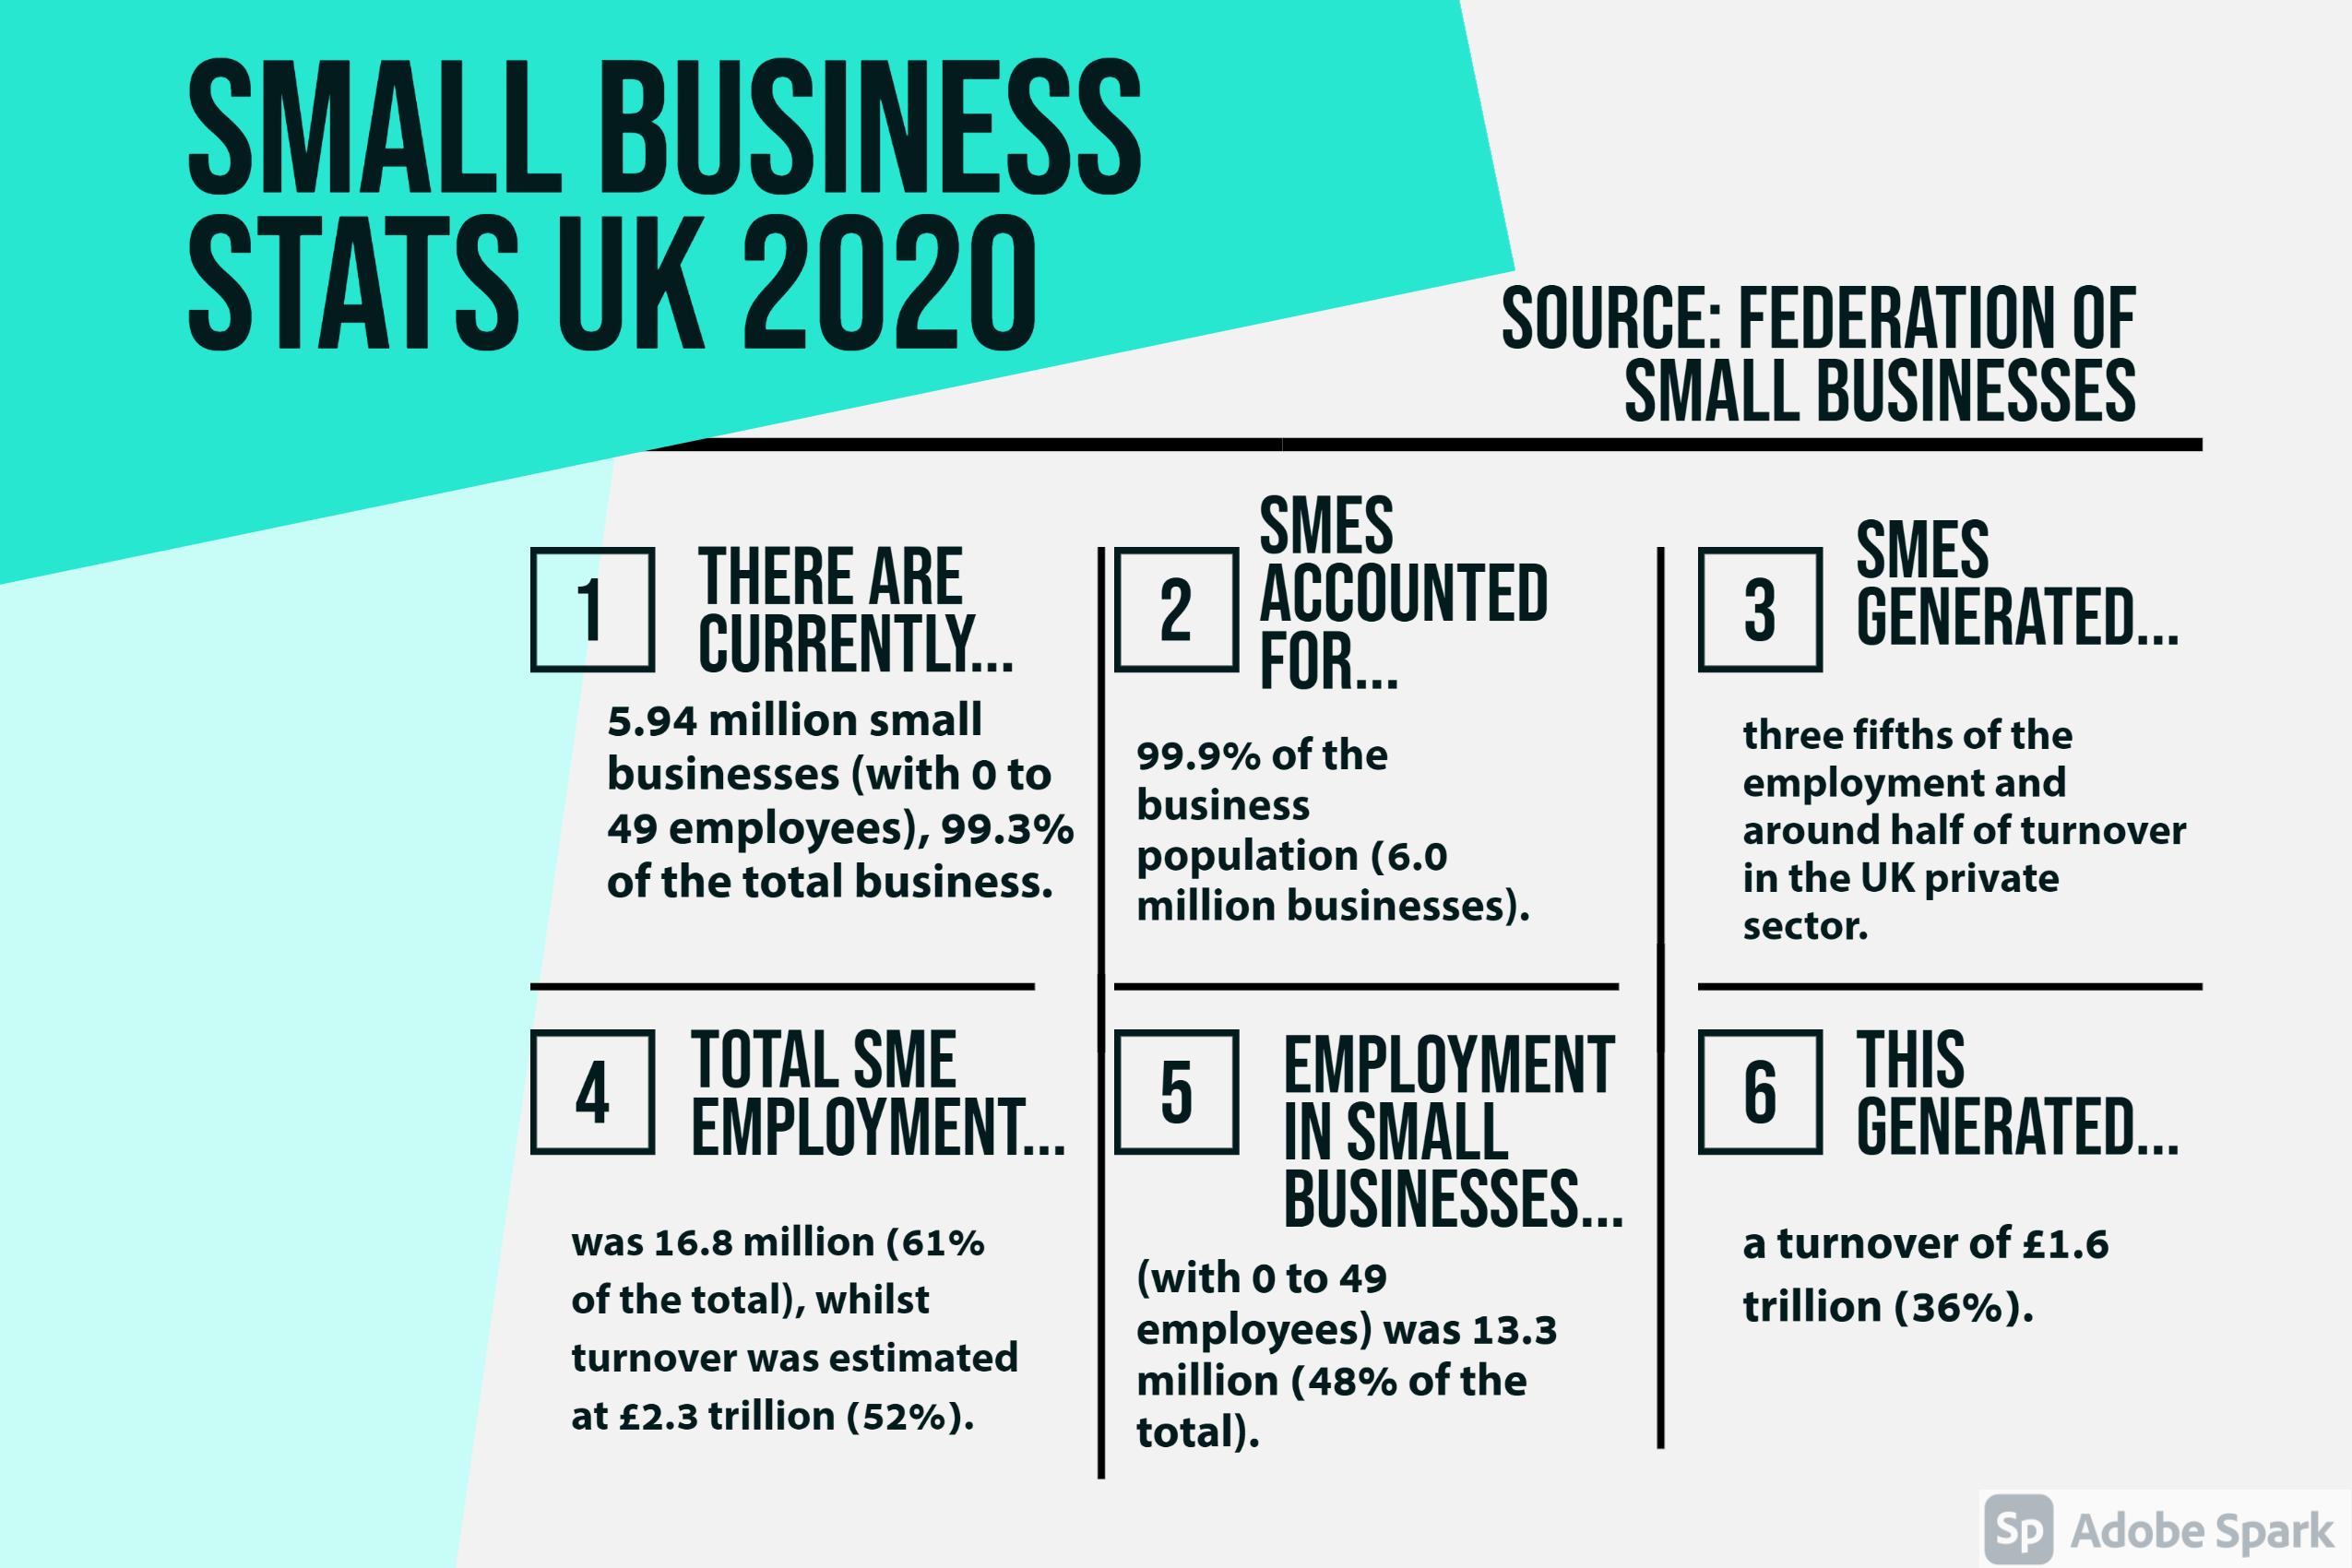 small-business-stats-uk-2020